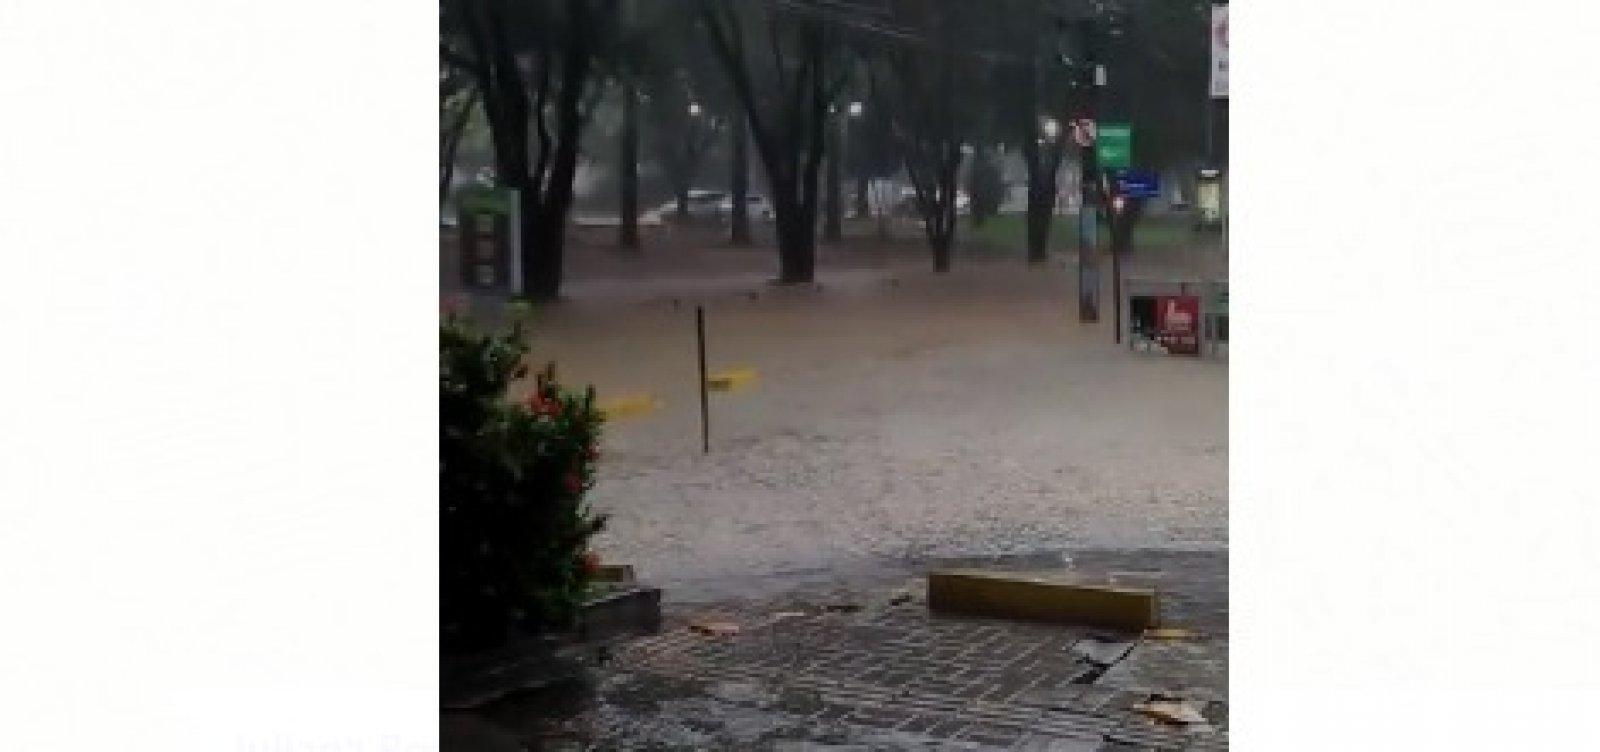 Leitor denuncia ponto de alagamento na Pituba; veja vídeo